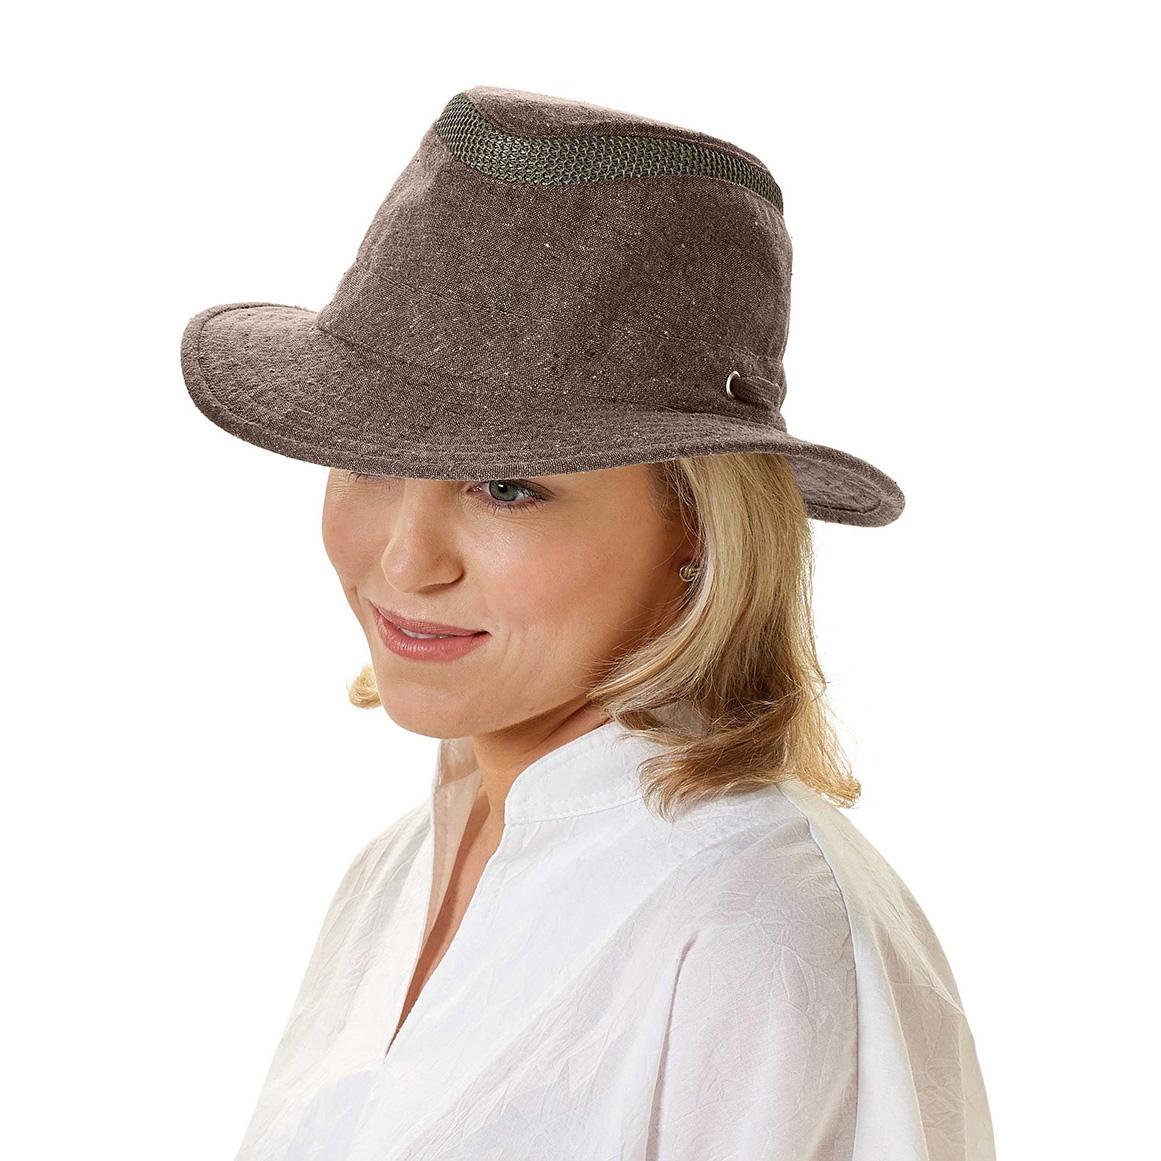 36c81301f Tilley Intermediate Curved Brim Mash-Up Hat - Brown